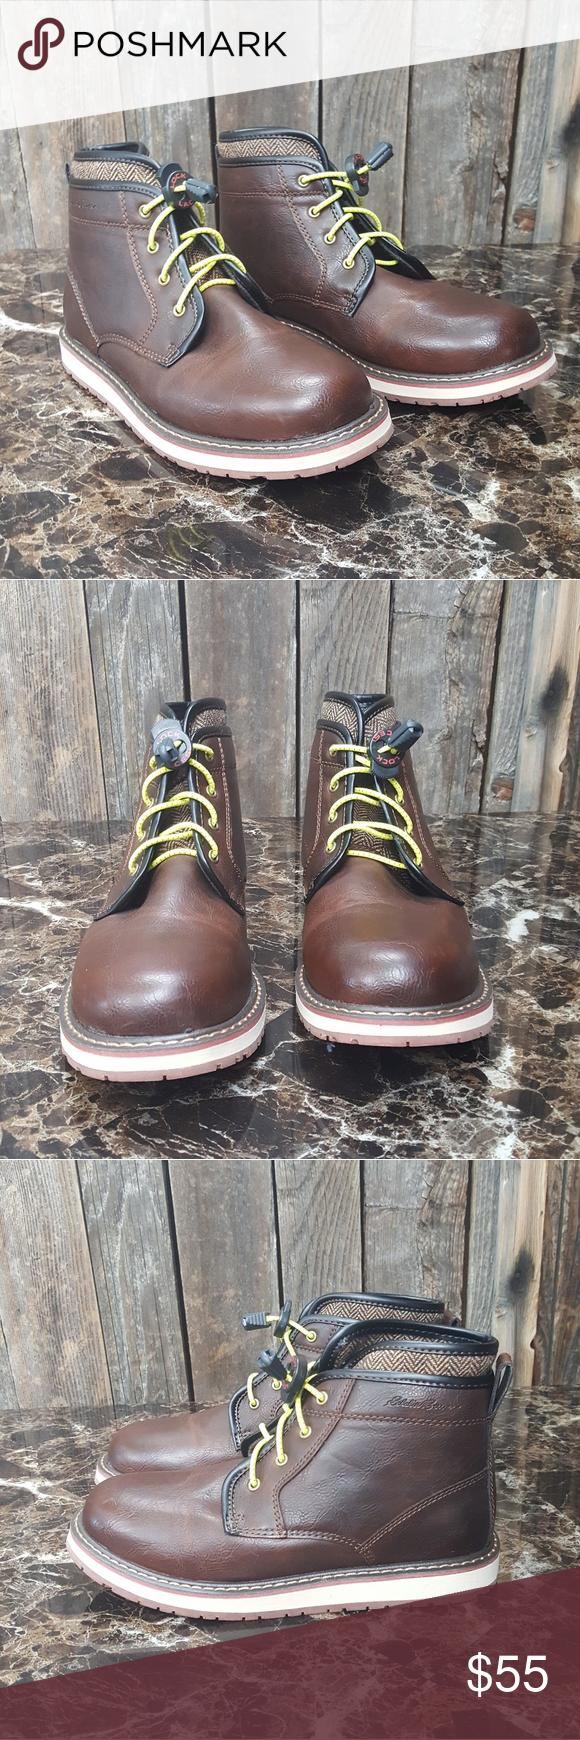 Eddie Bauer size 4 big boys Beautiful shoes. Eddie Bauer